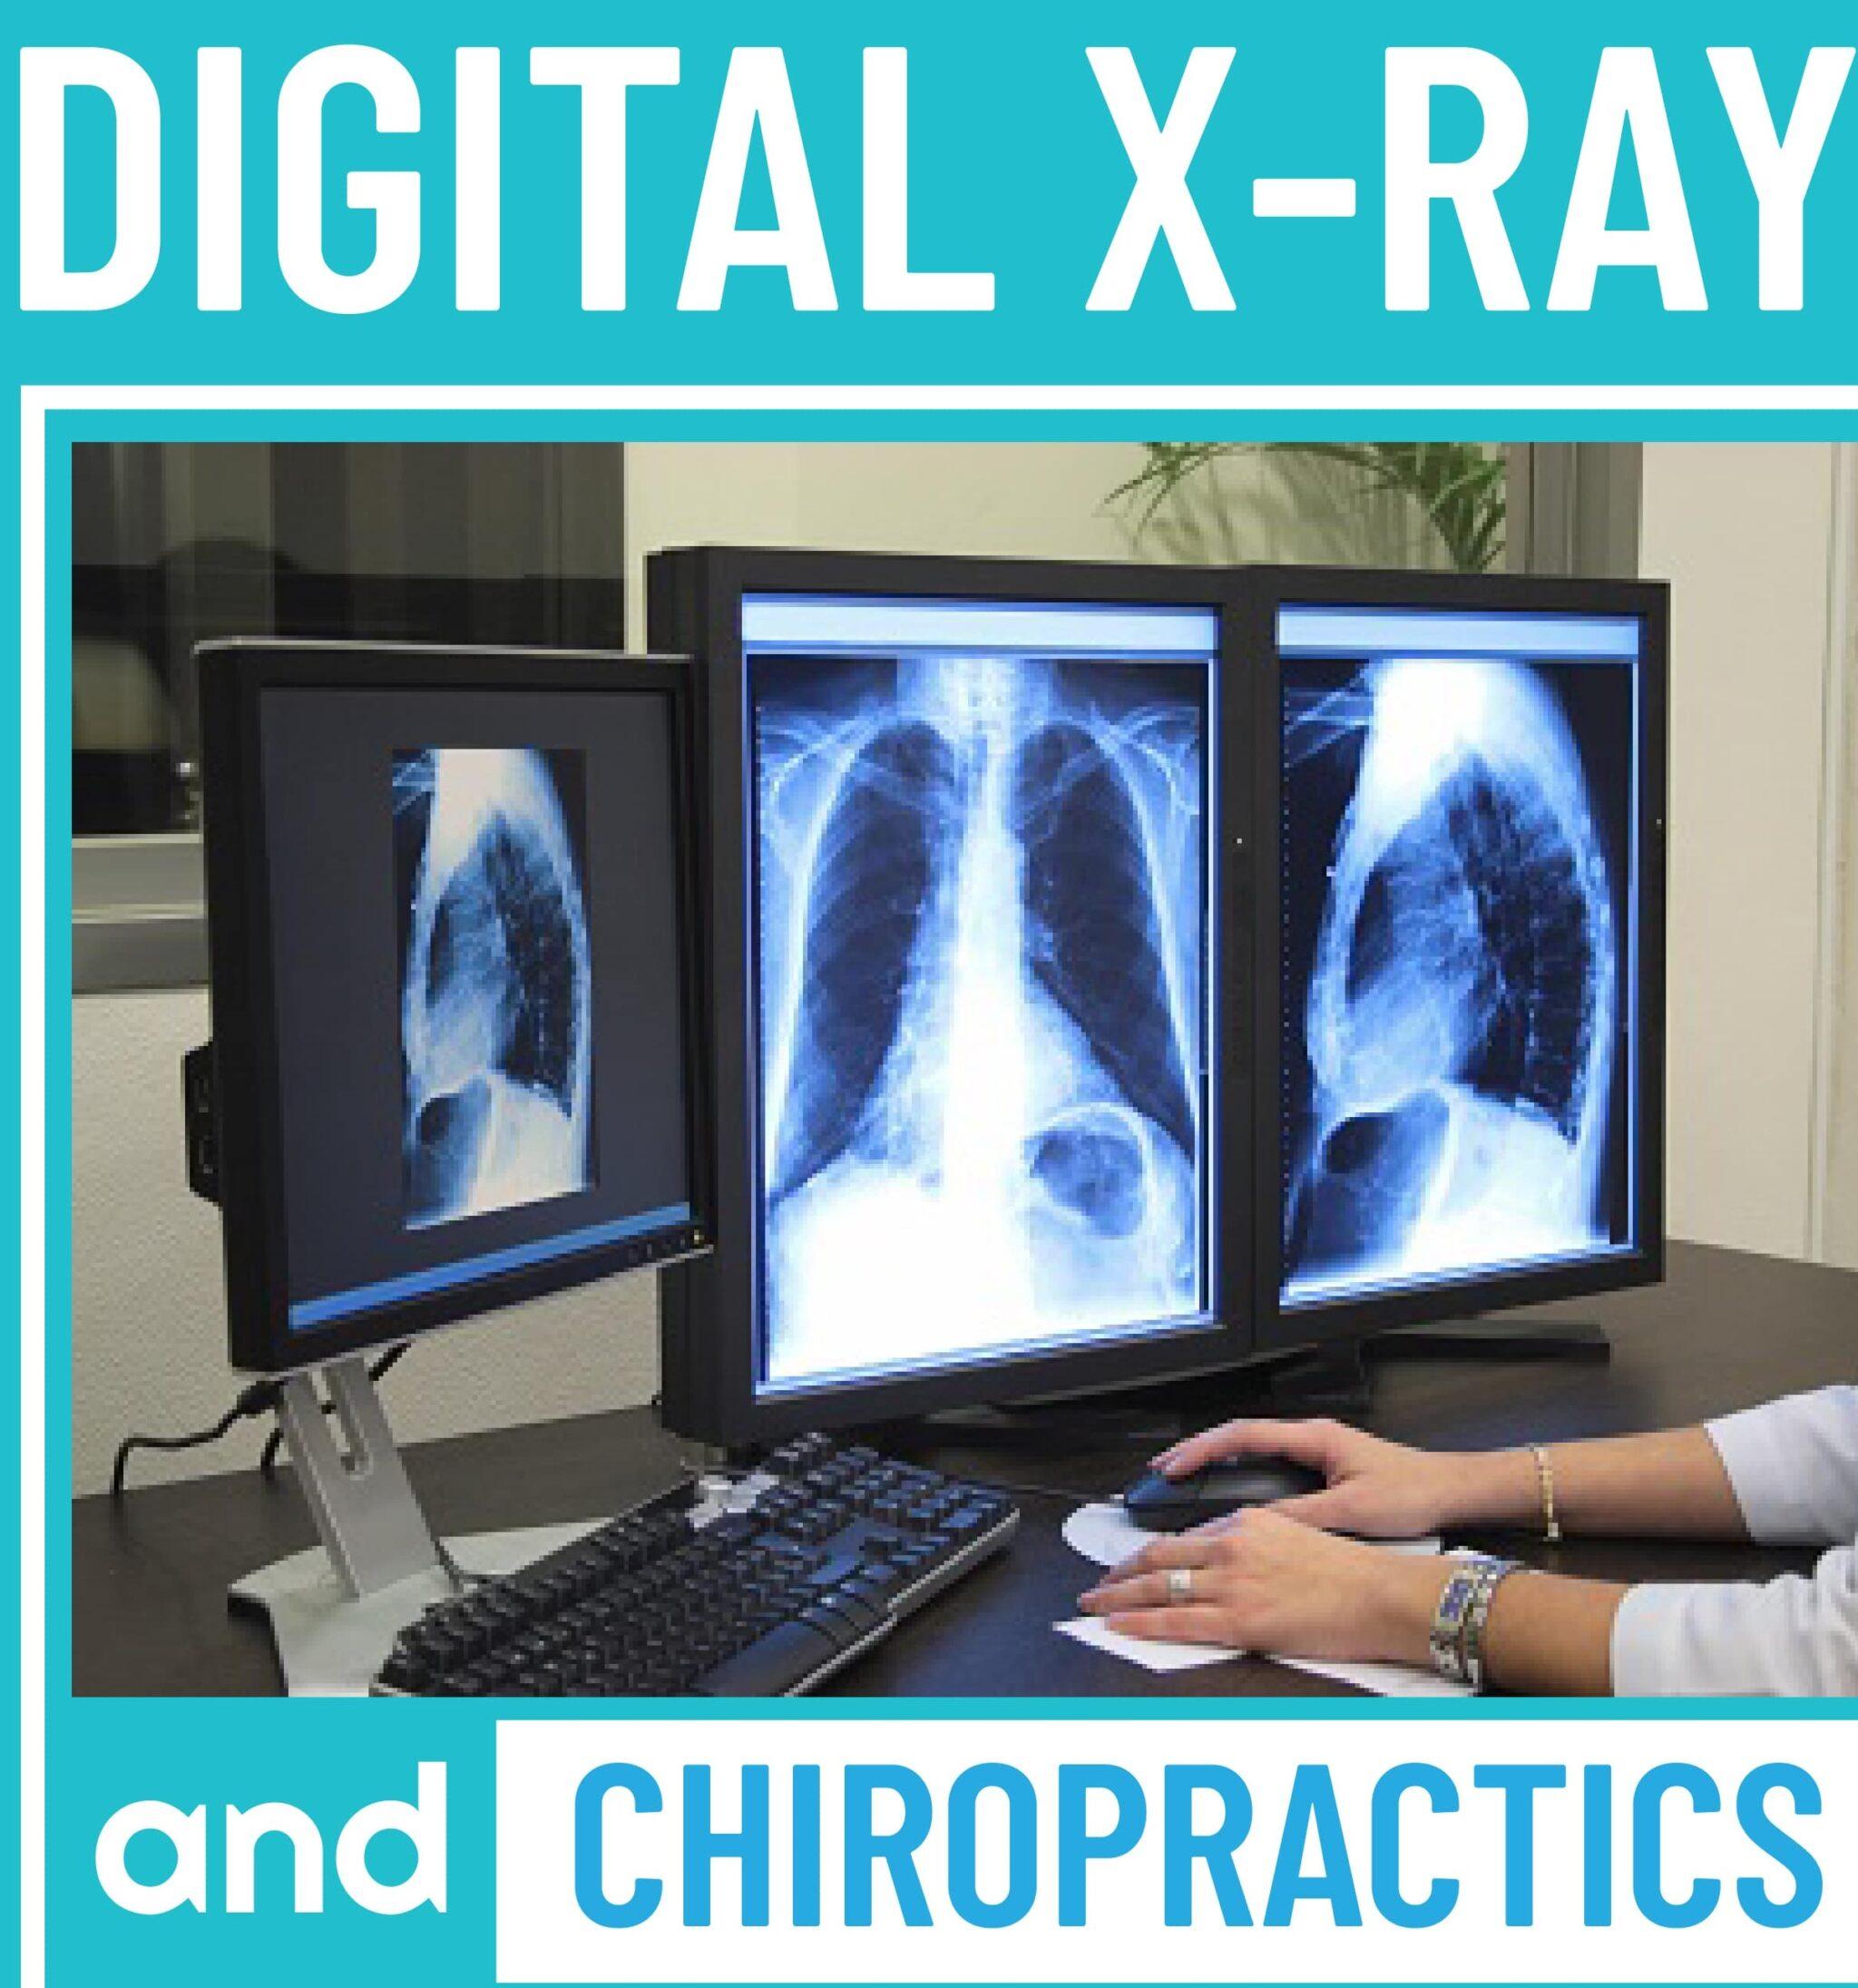 Digital X-Ray and Chiropractics